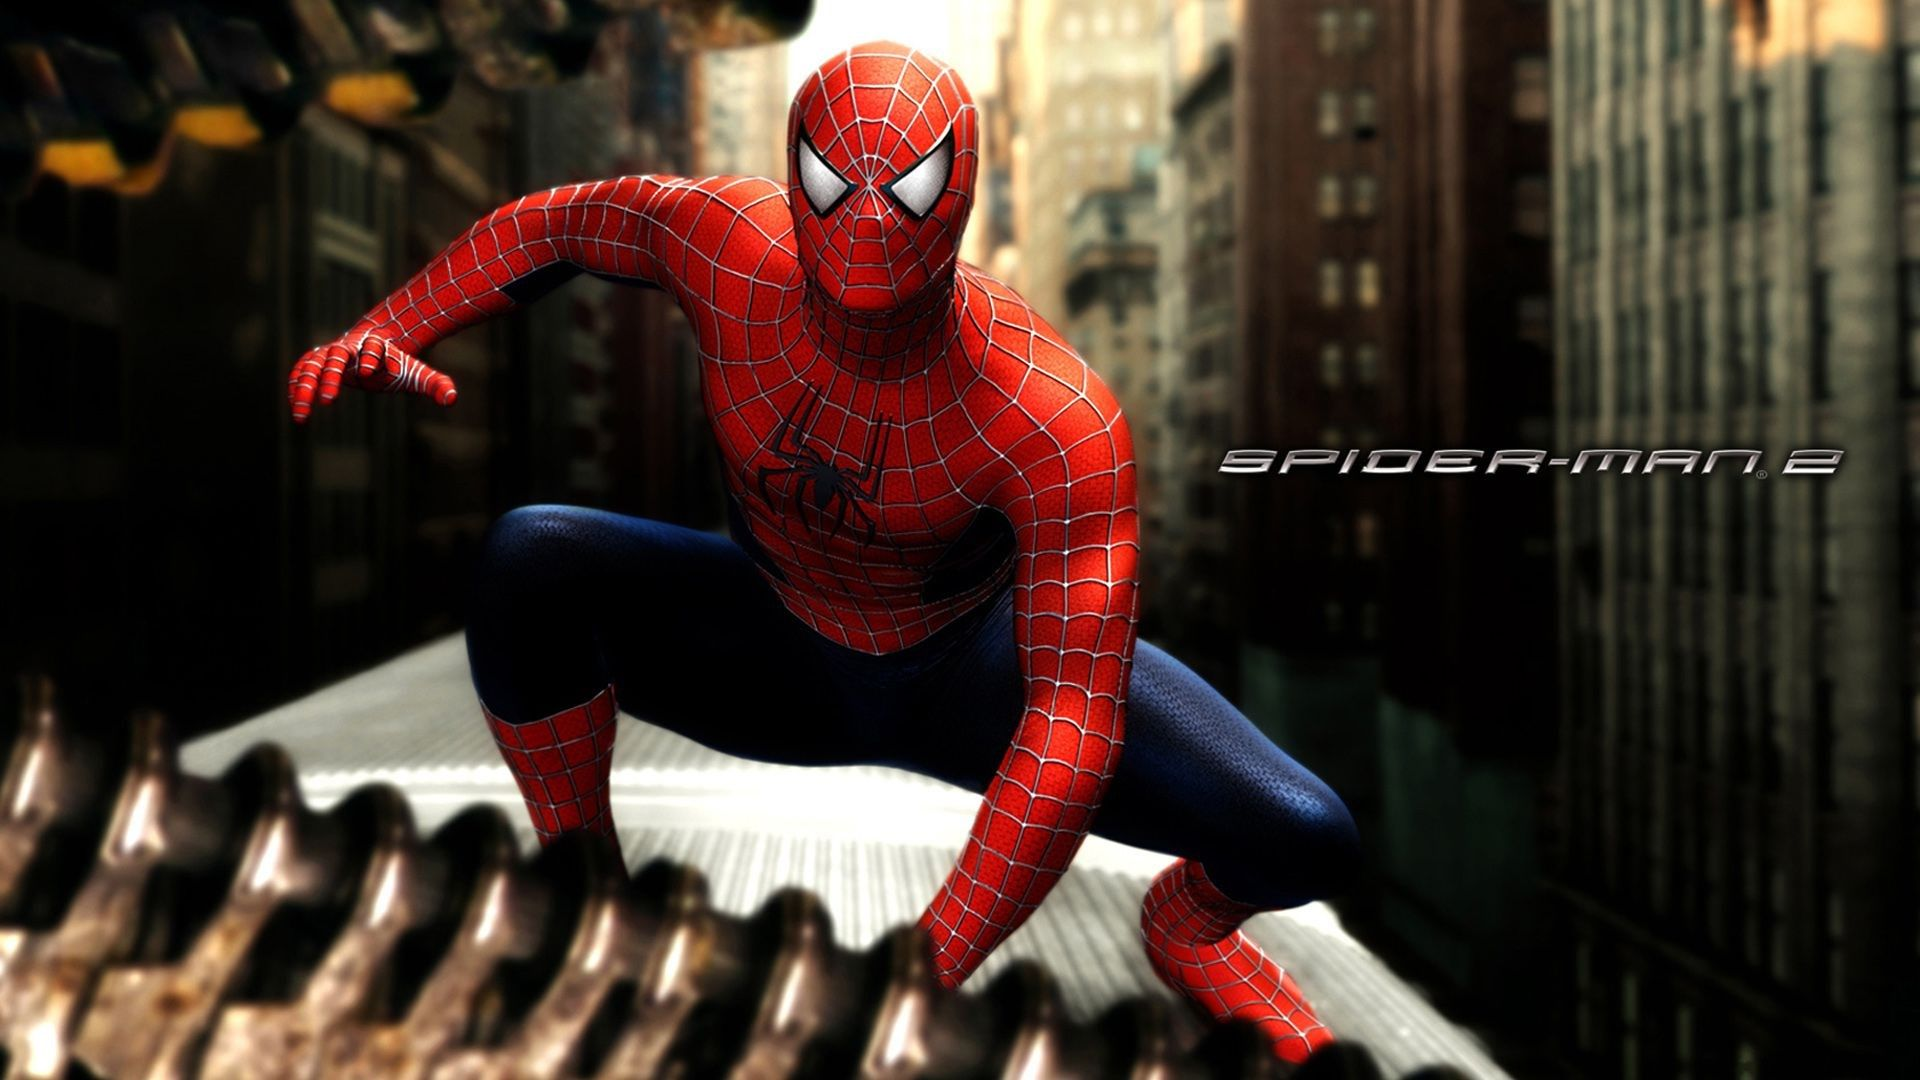 Wallpapers For Desktop Spider Man 2 Wallpaper 256 Kb